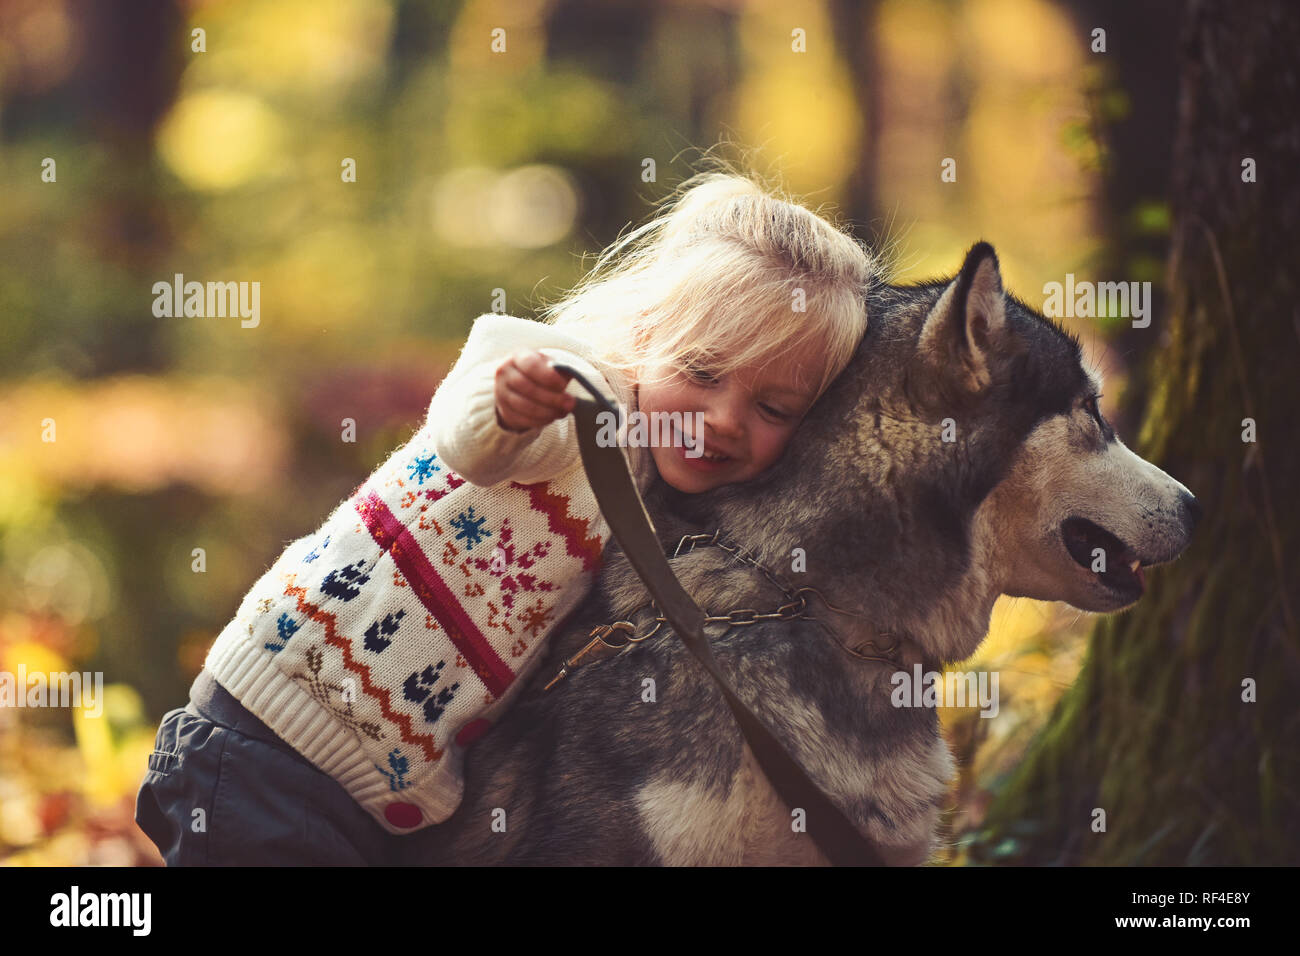 Happy little girl with her dog husky - Stock Image